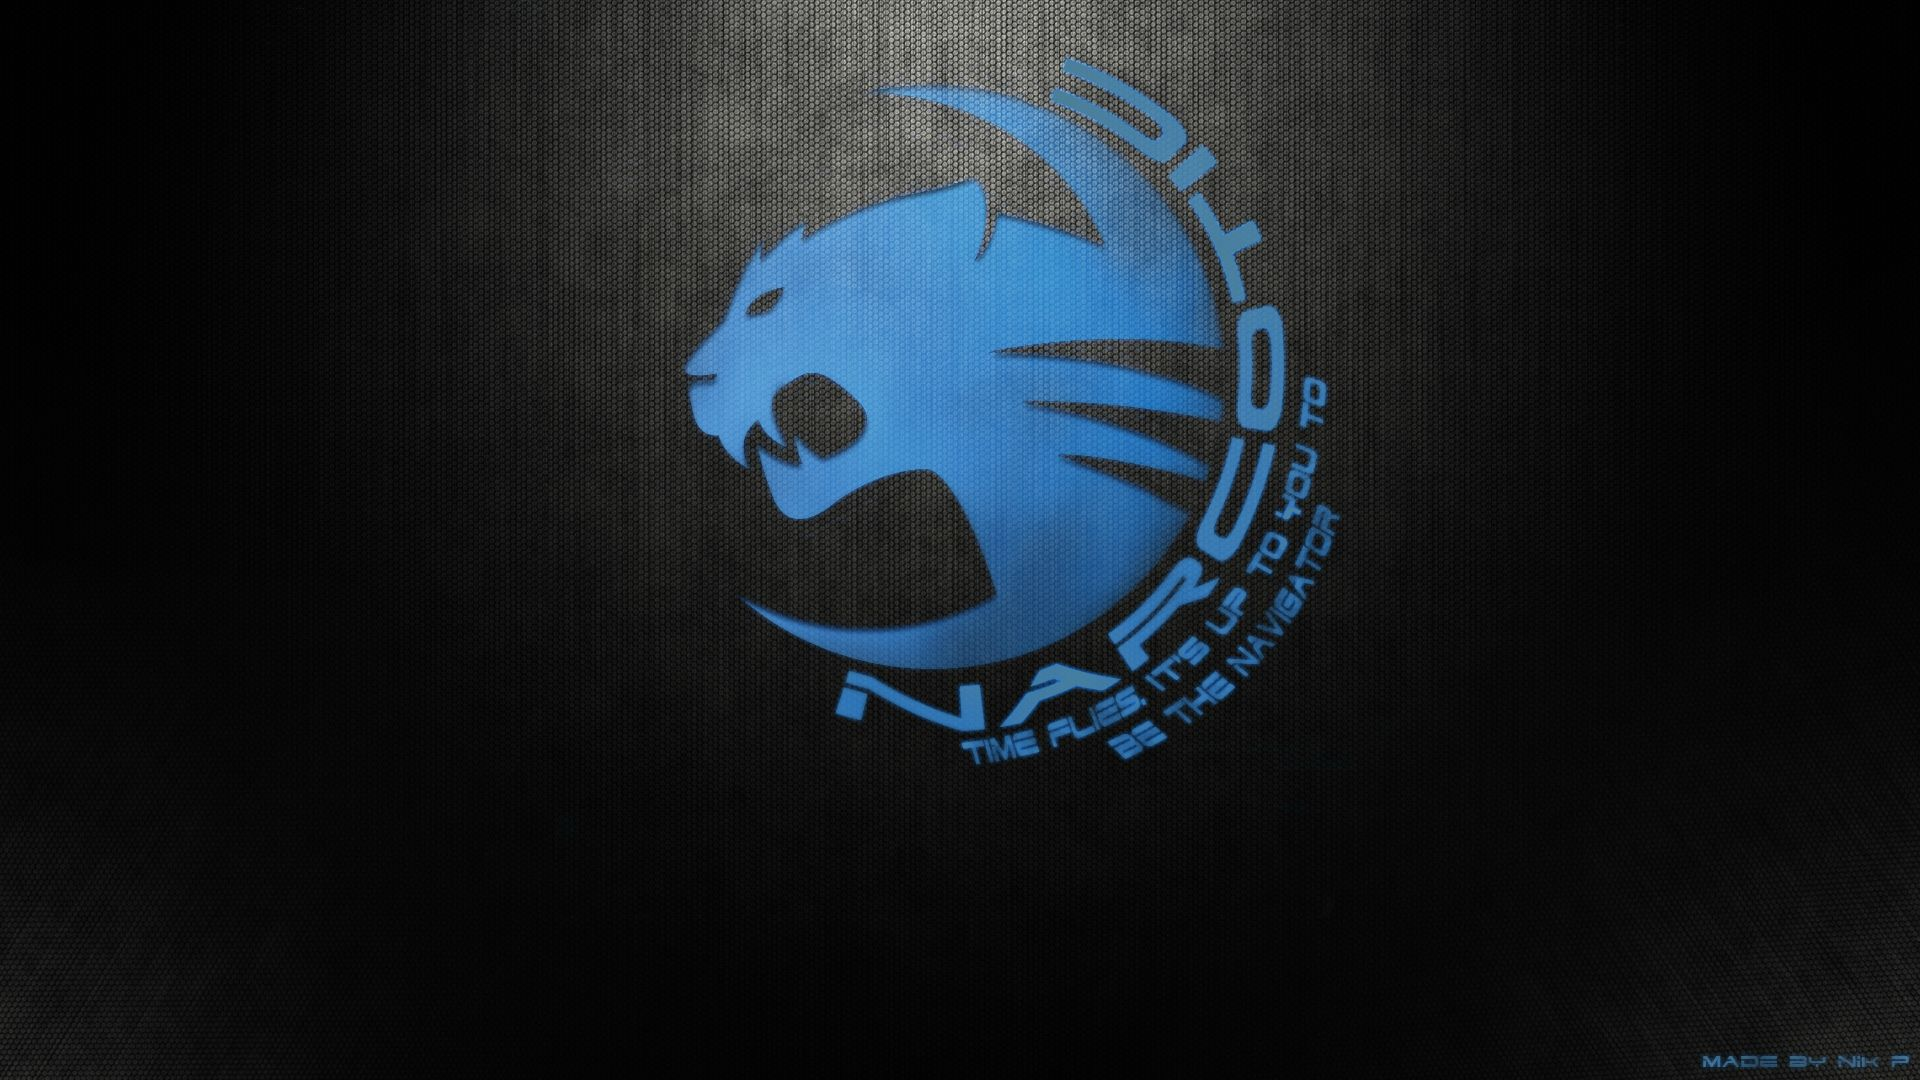 download roccat logo wallpaper - photo #9